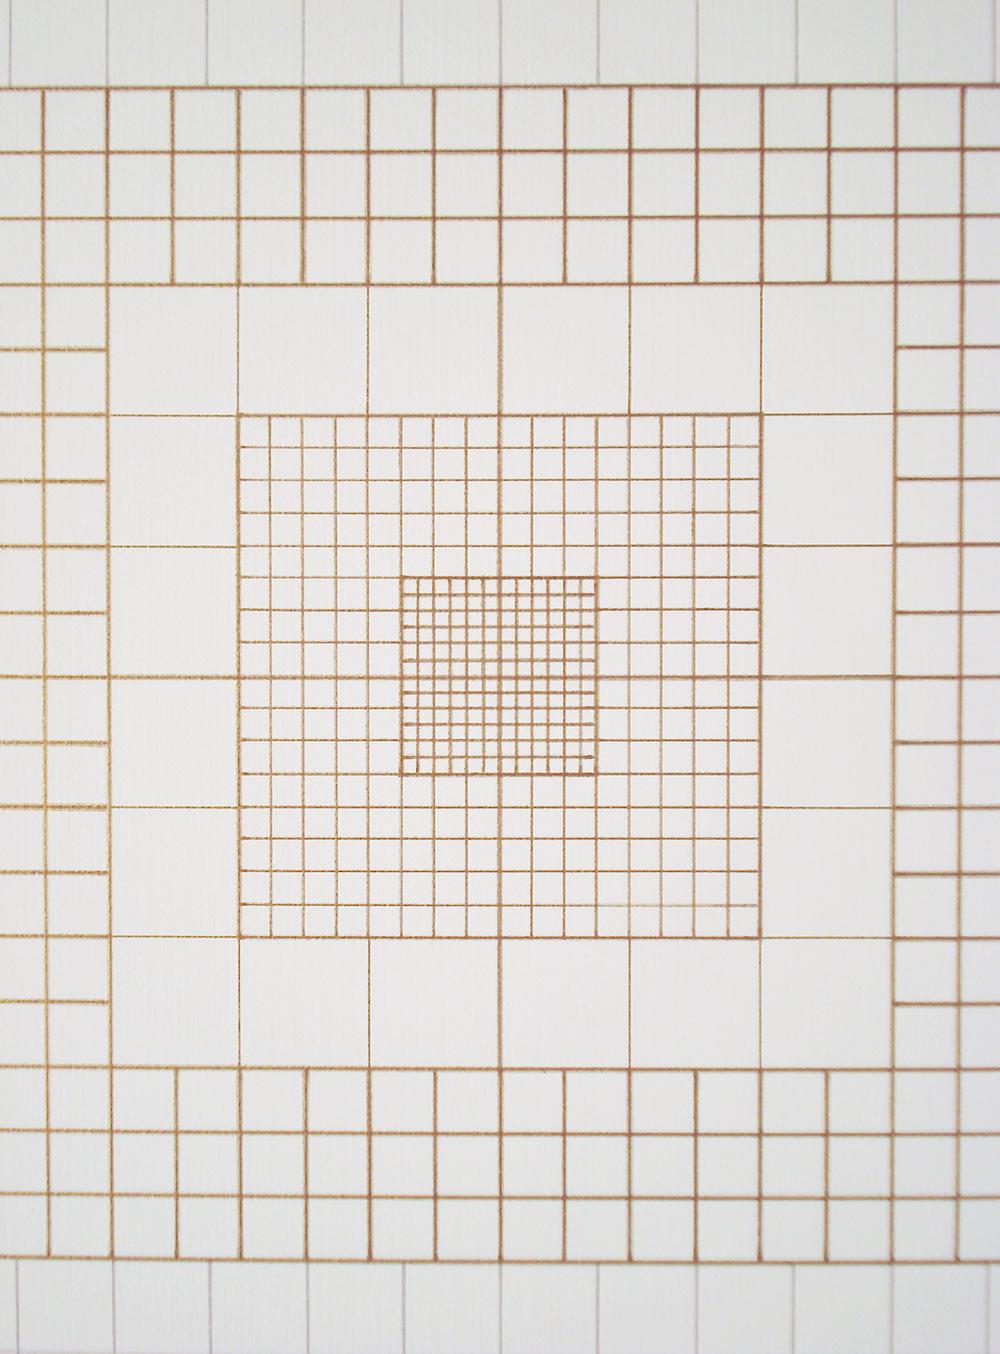 Yantra-origo-metrum [20180512]_2018_acrylic-on-canvas_29 1-2x29 1-2in.[75x75cm]-3_kB.jpg